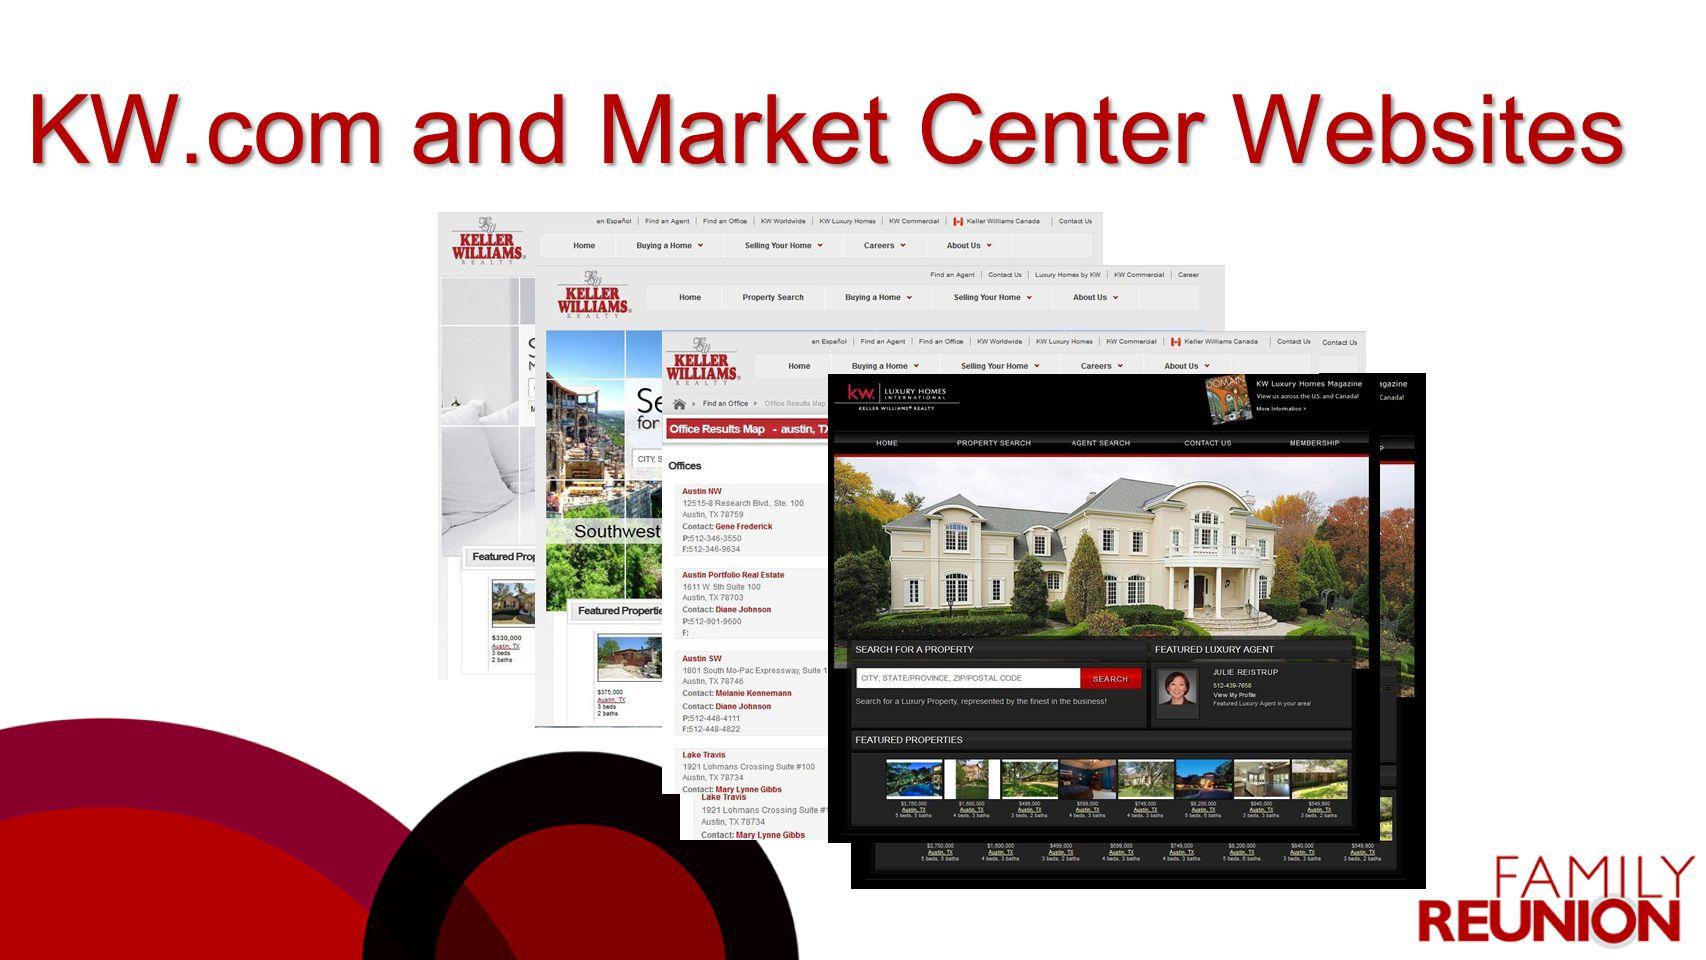 KW.com and Market Center Websites